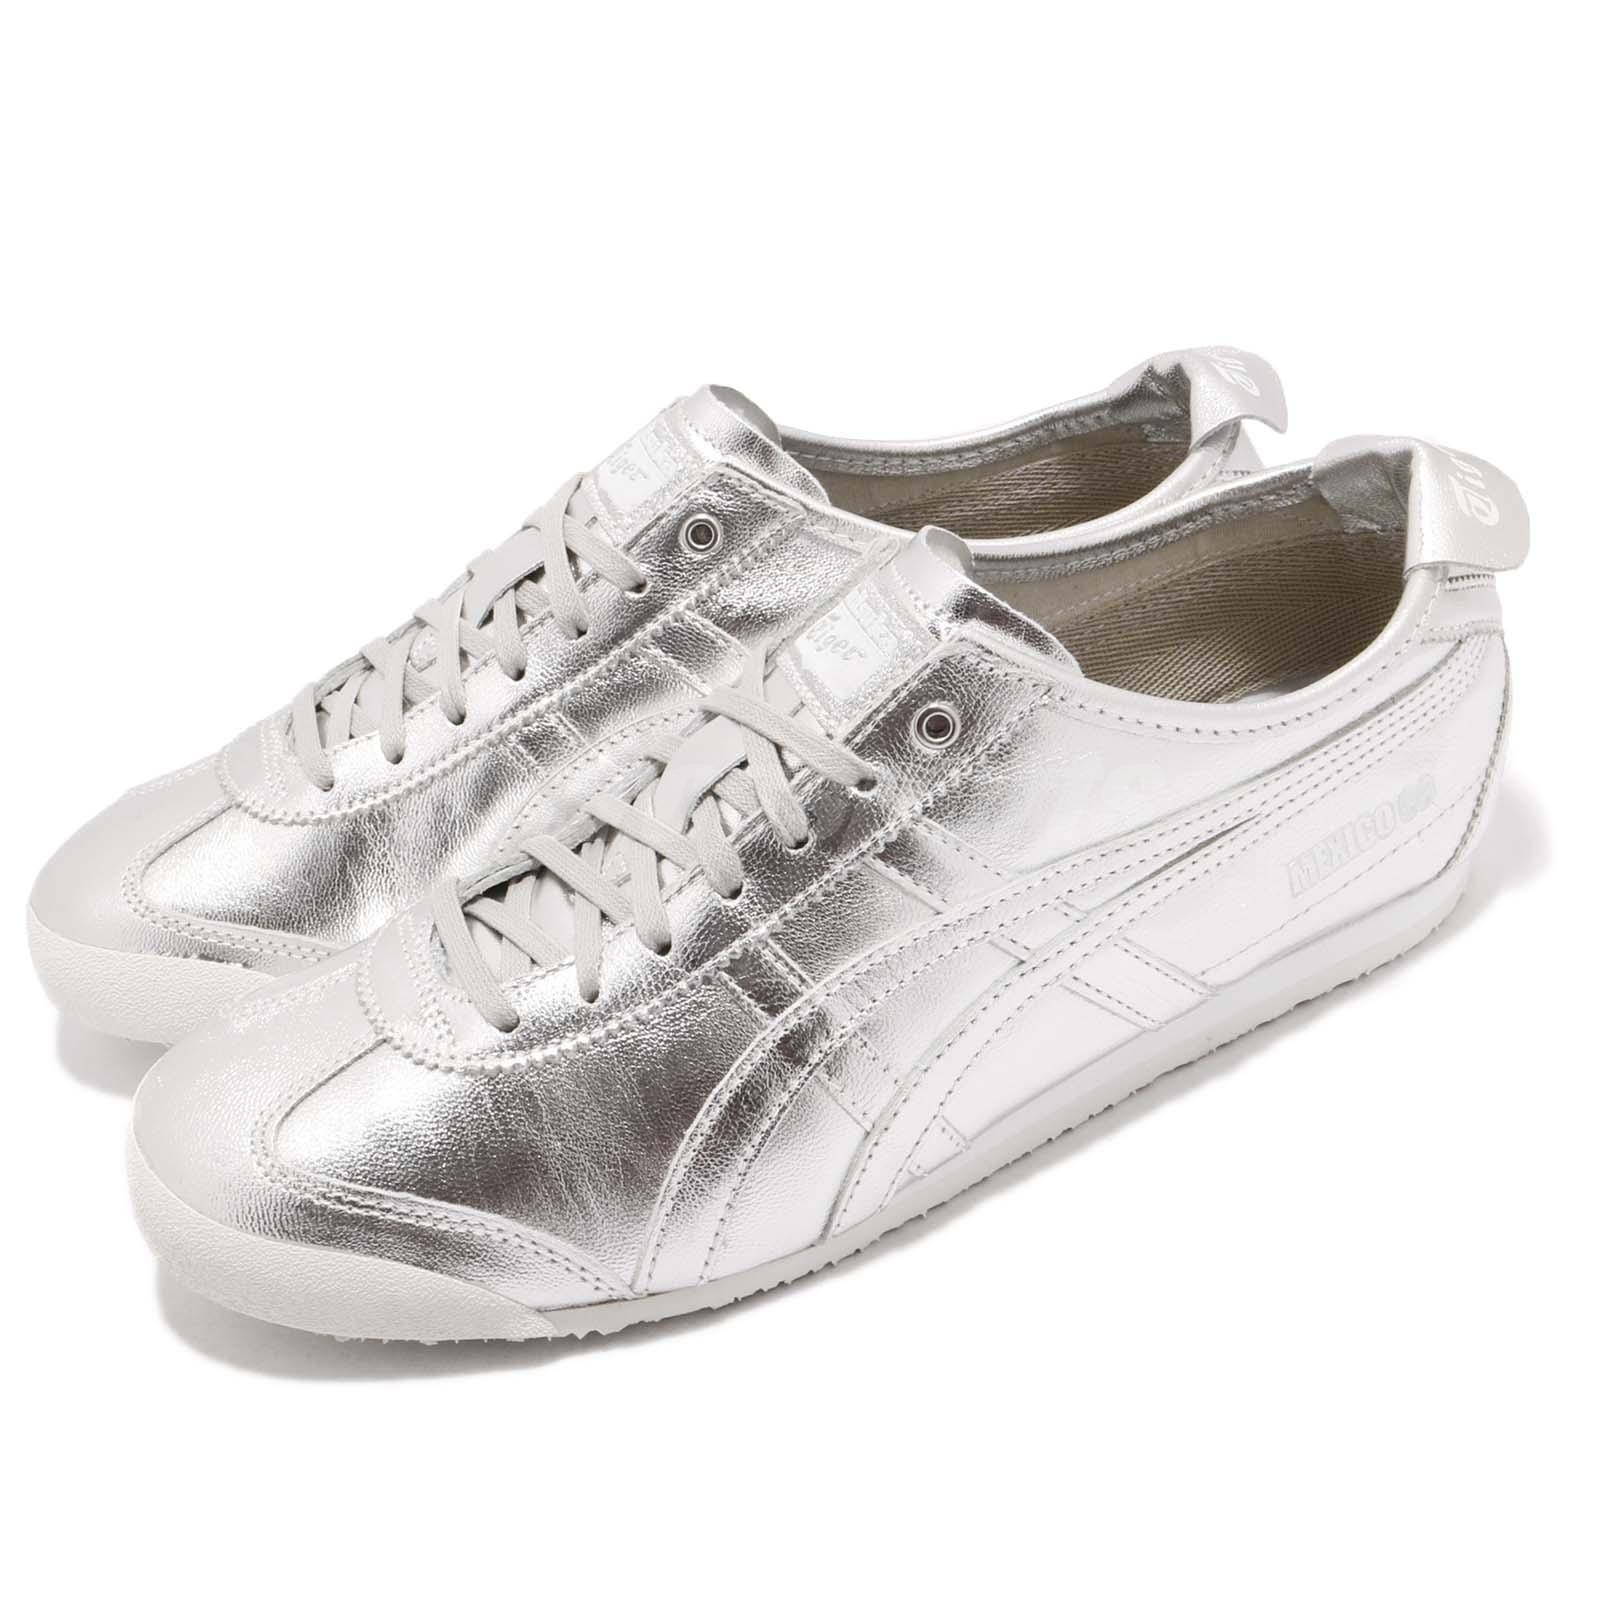 size 40 1a0f6 dedc7 Detalles acerca de Asics Onitsuka Tiger MEXICO 66 Zapatos informales de  hombre Blanco Plateado Correr D5R1L-9393- mostrar título original